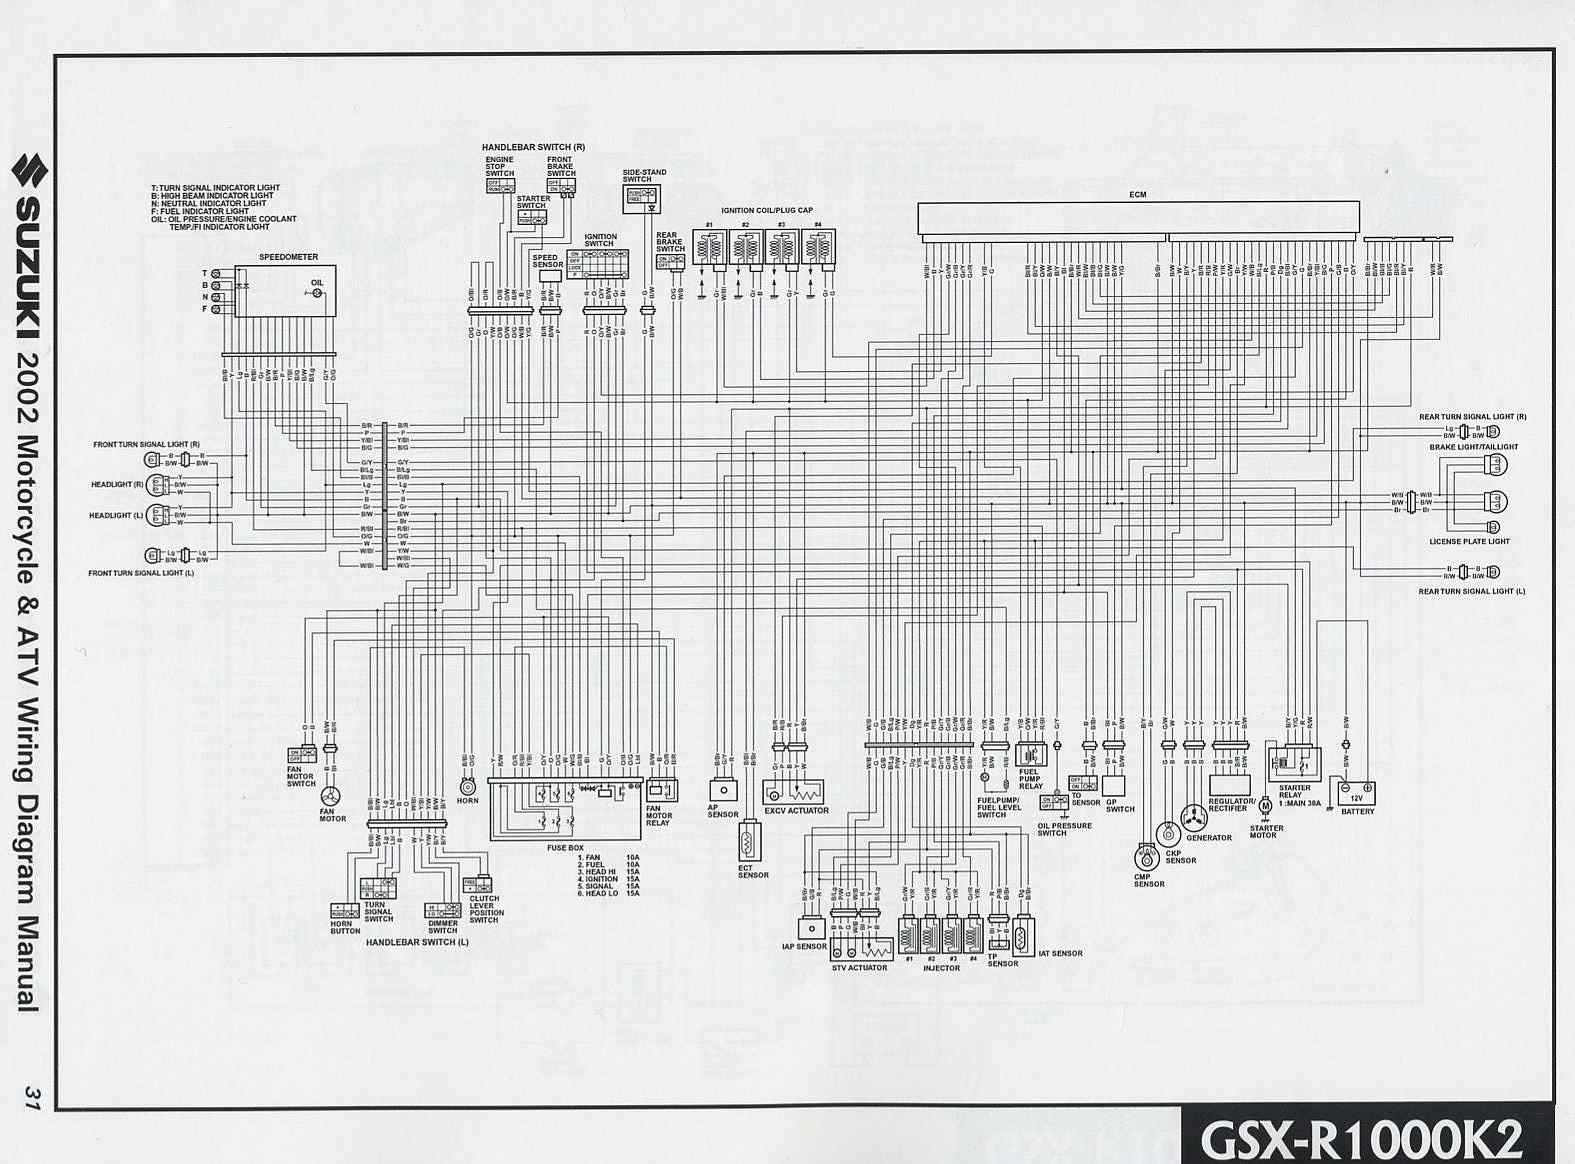 gs xr 600 wiring diagram wiring diagram  04 gsxr 600 wiring diagrams free download diagram #13